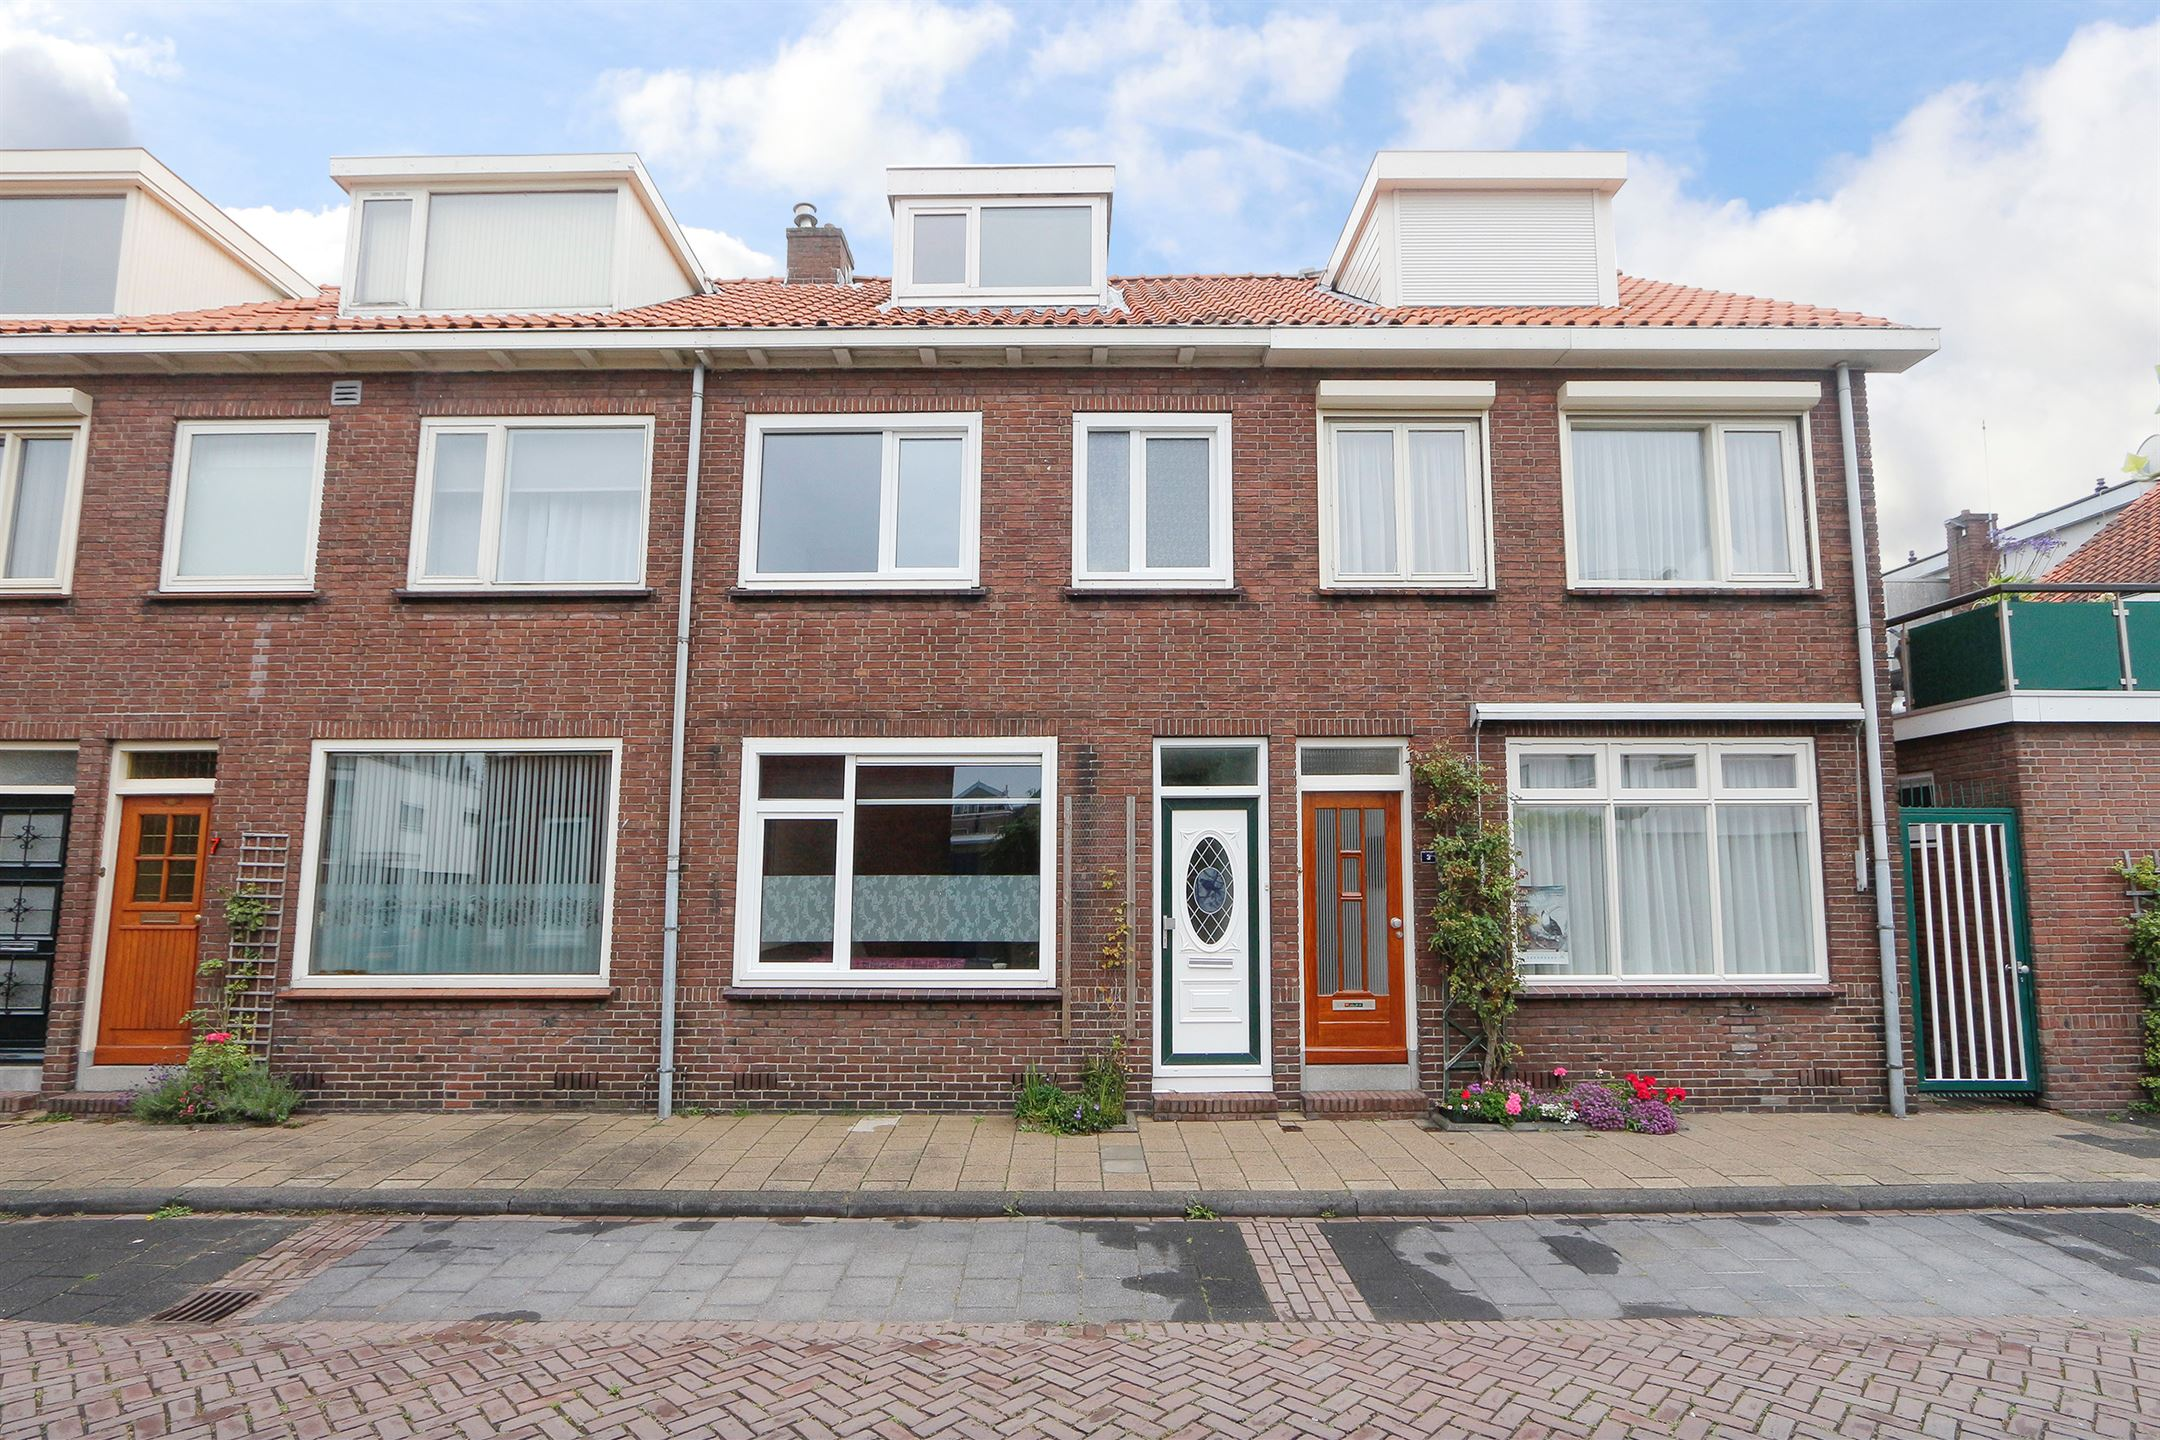 Verkocht: Nicolaasstraat 5 3311 ZN Dordrecht [funda]